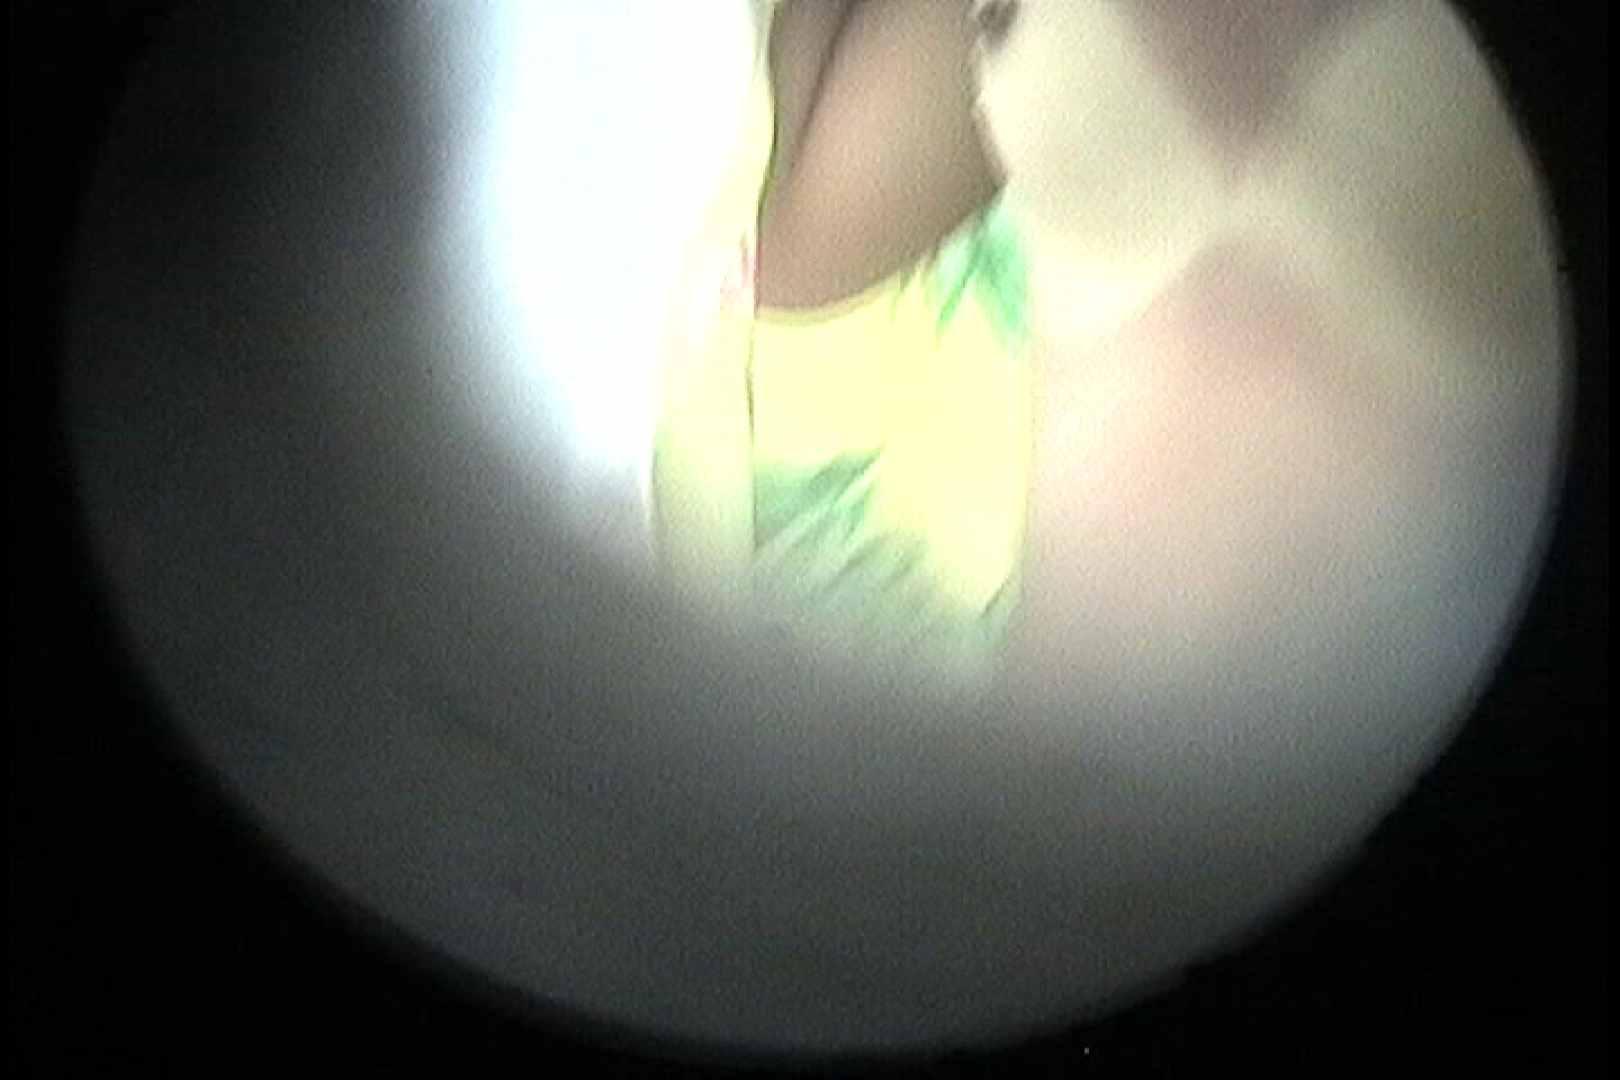 No.22 日焼け跡とオッパイの関係がおかしな貧乳ギャル 超エロギャル 盗み撮り動画キャプチャ 99枚 58